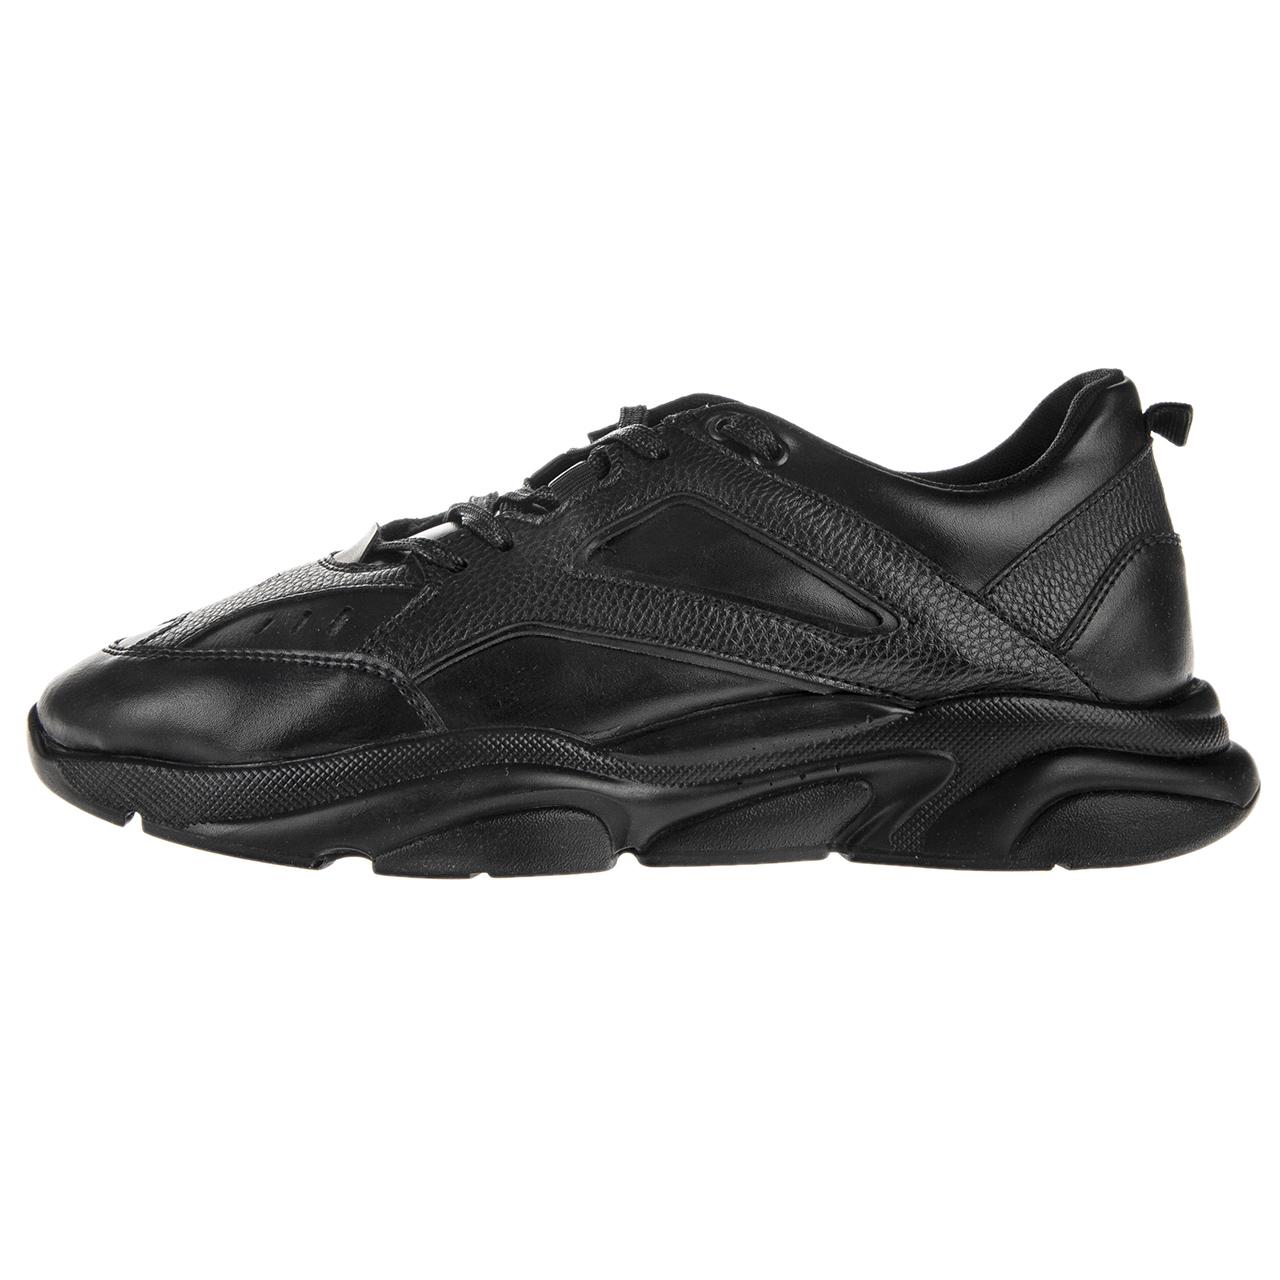 عکس کفش راحتی مردانه آراکس طرح فیلیپ پلین کد 130